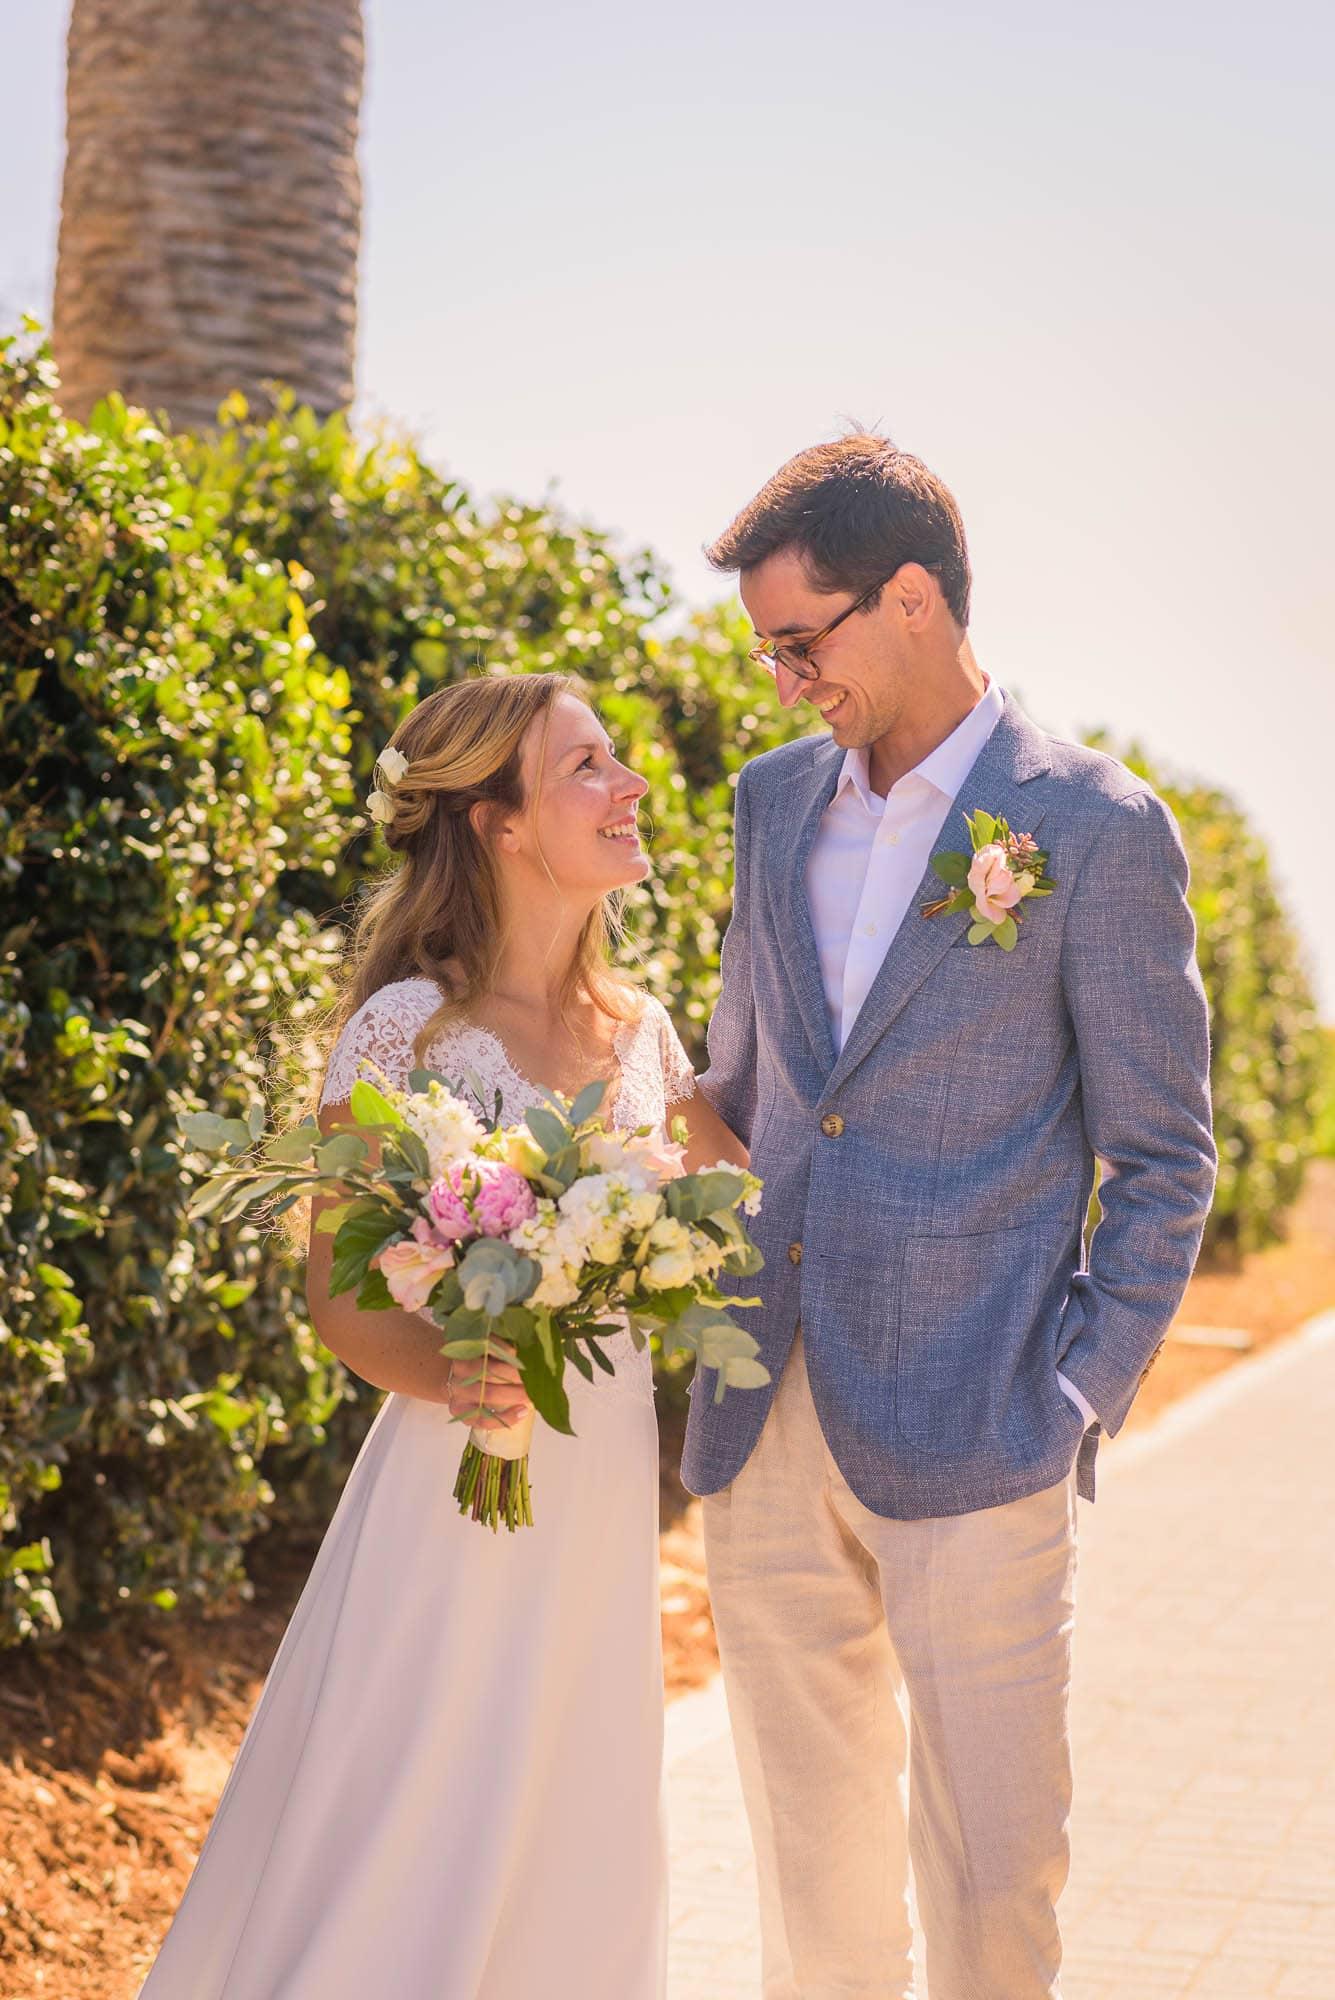 014_Alan_and_Heidi_Wedding_Verena_Andreas